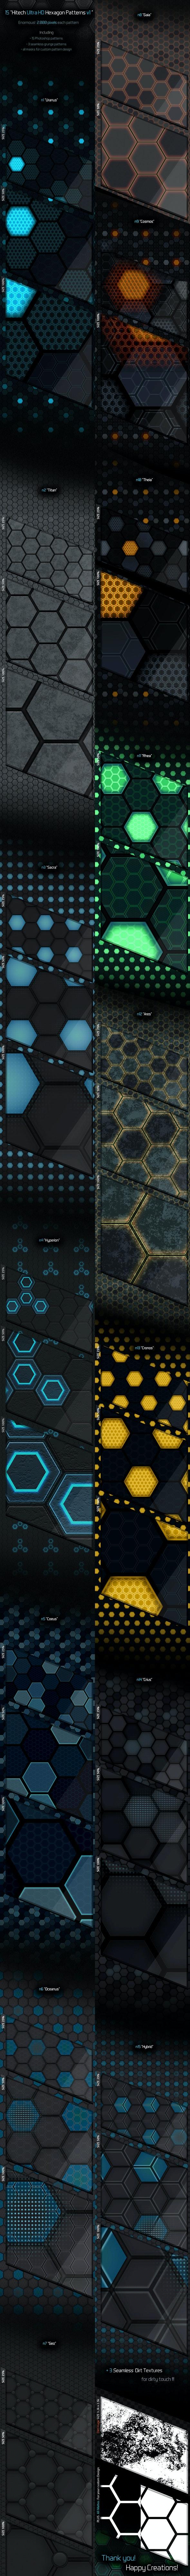 Ulta HD Hexagon Patterns v1 - Techno / Futuristic Textures / Fills / Patterns